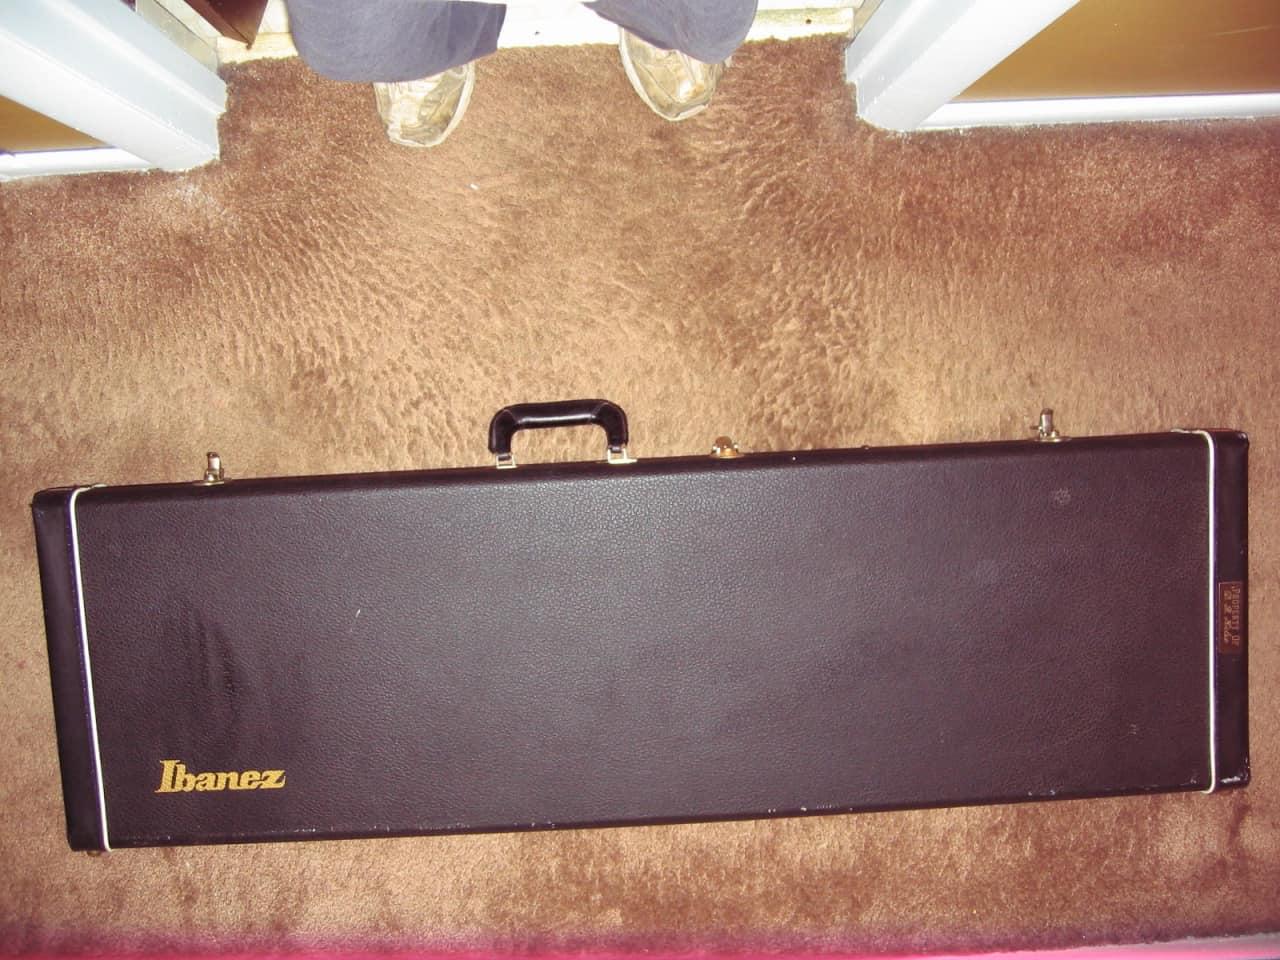 Vintage Guitar Case : vintage ibanez guitar case or bass guitar case reverb ~ Russianpoet.info Haus und Dekorationen